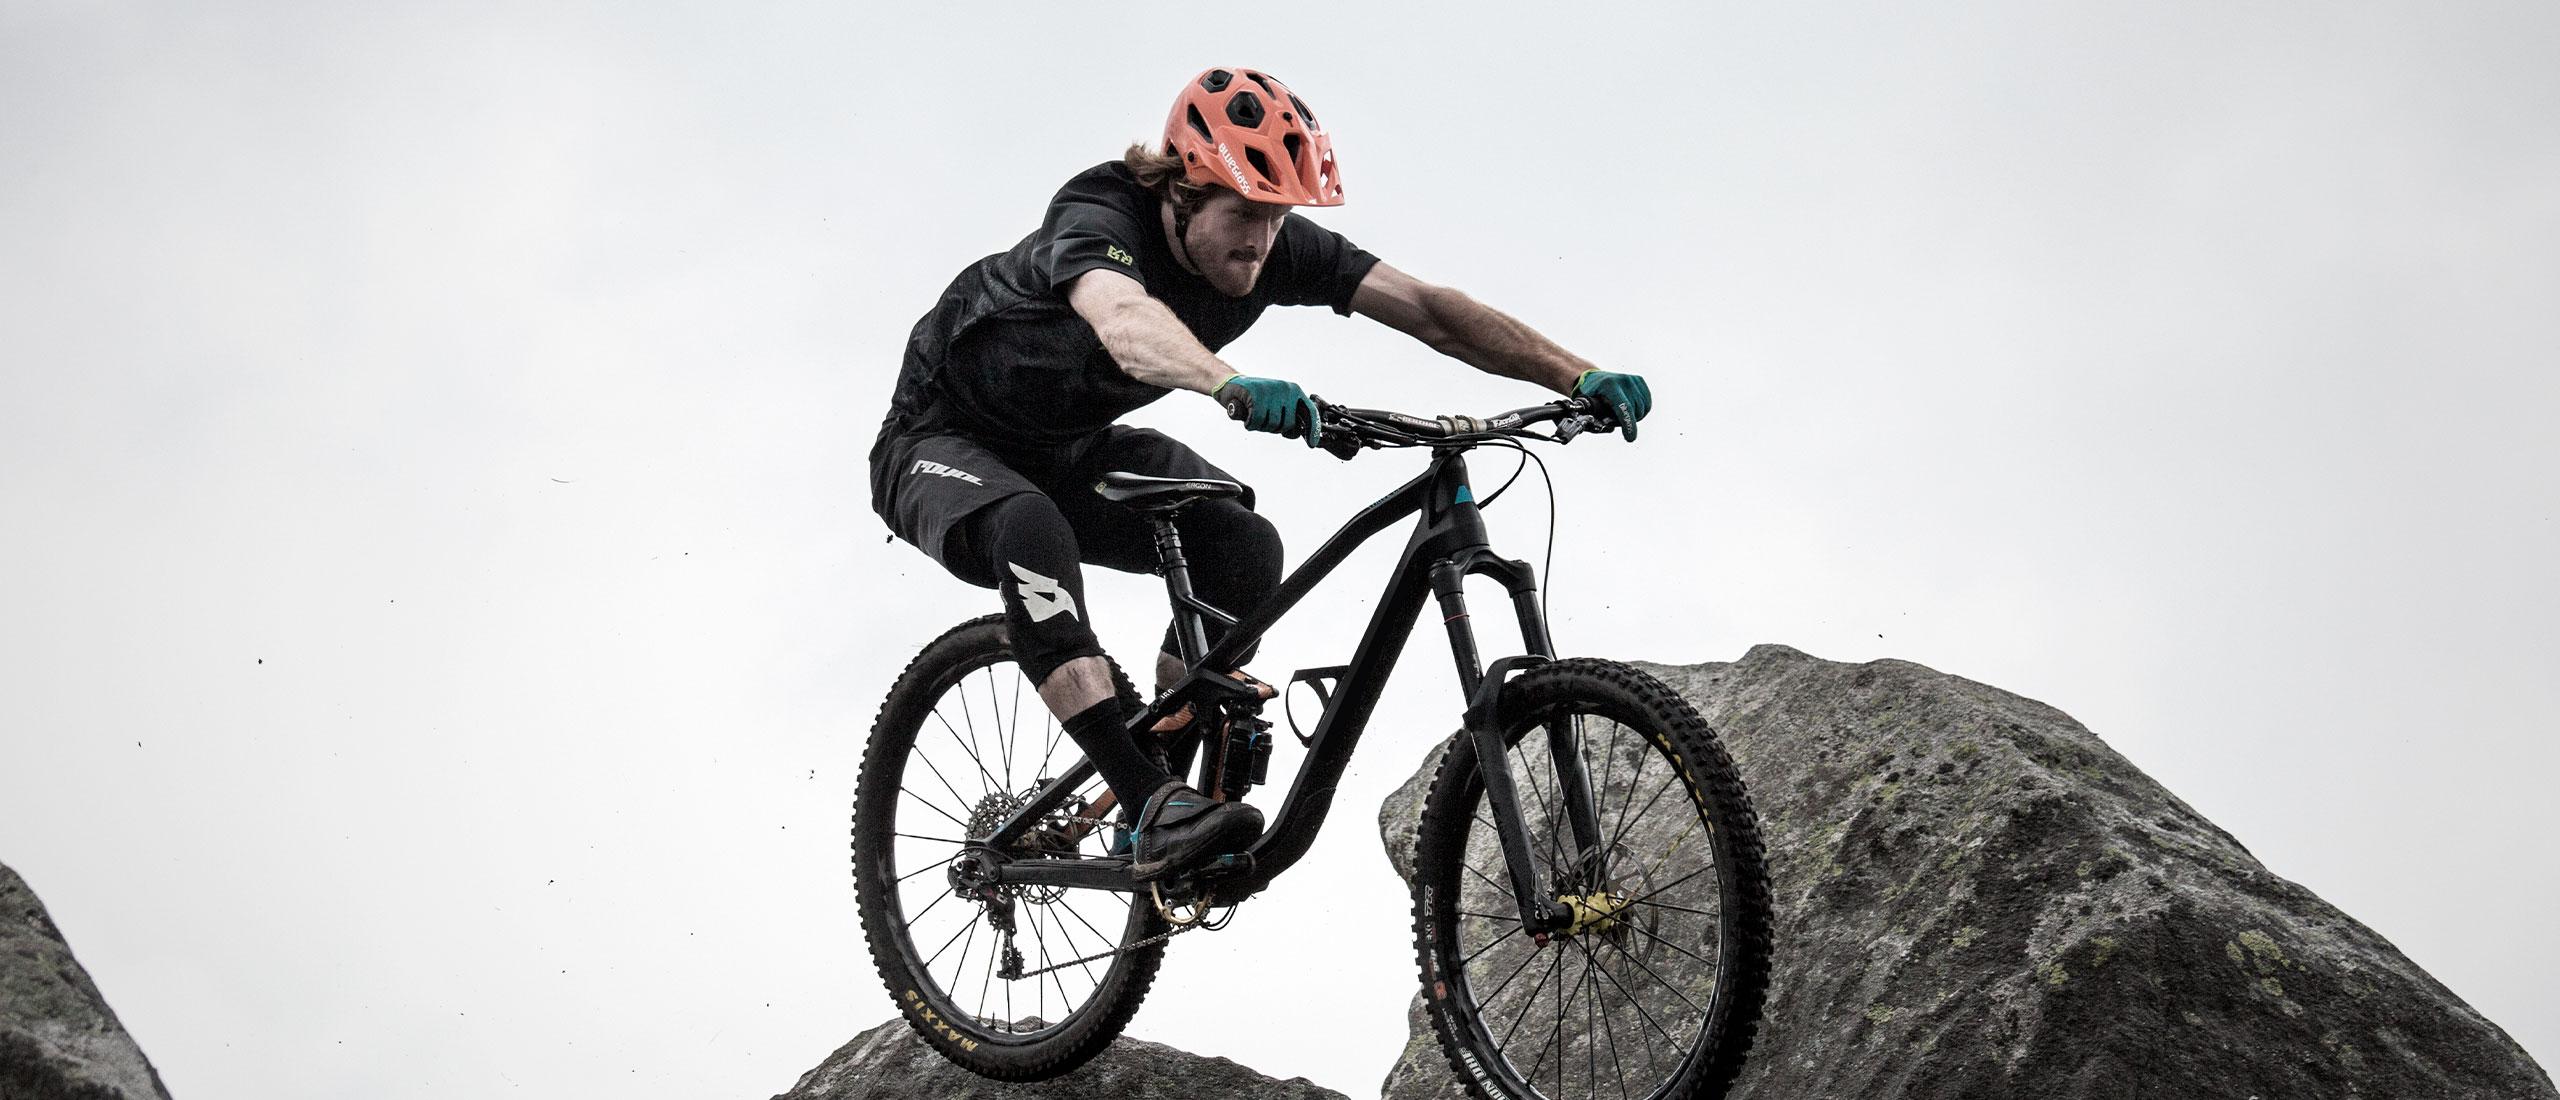 Bluegrass Skinny Protection made for Mountain Bike, Enduro and E-Bike